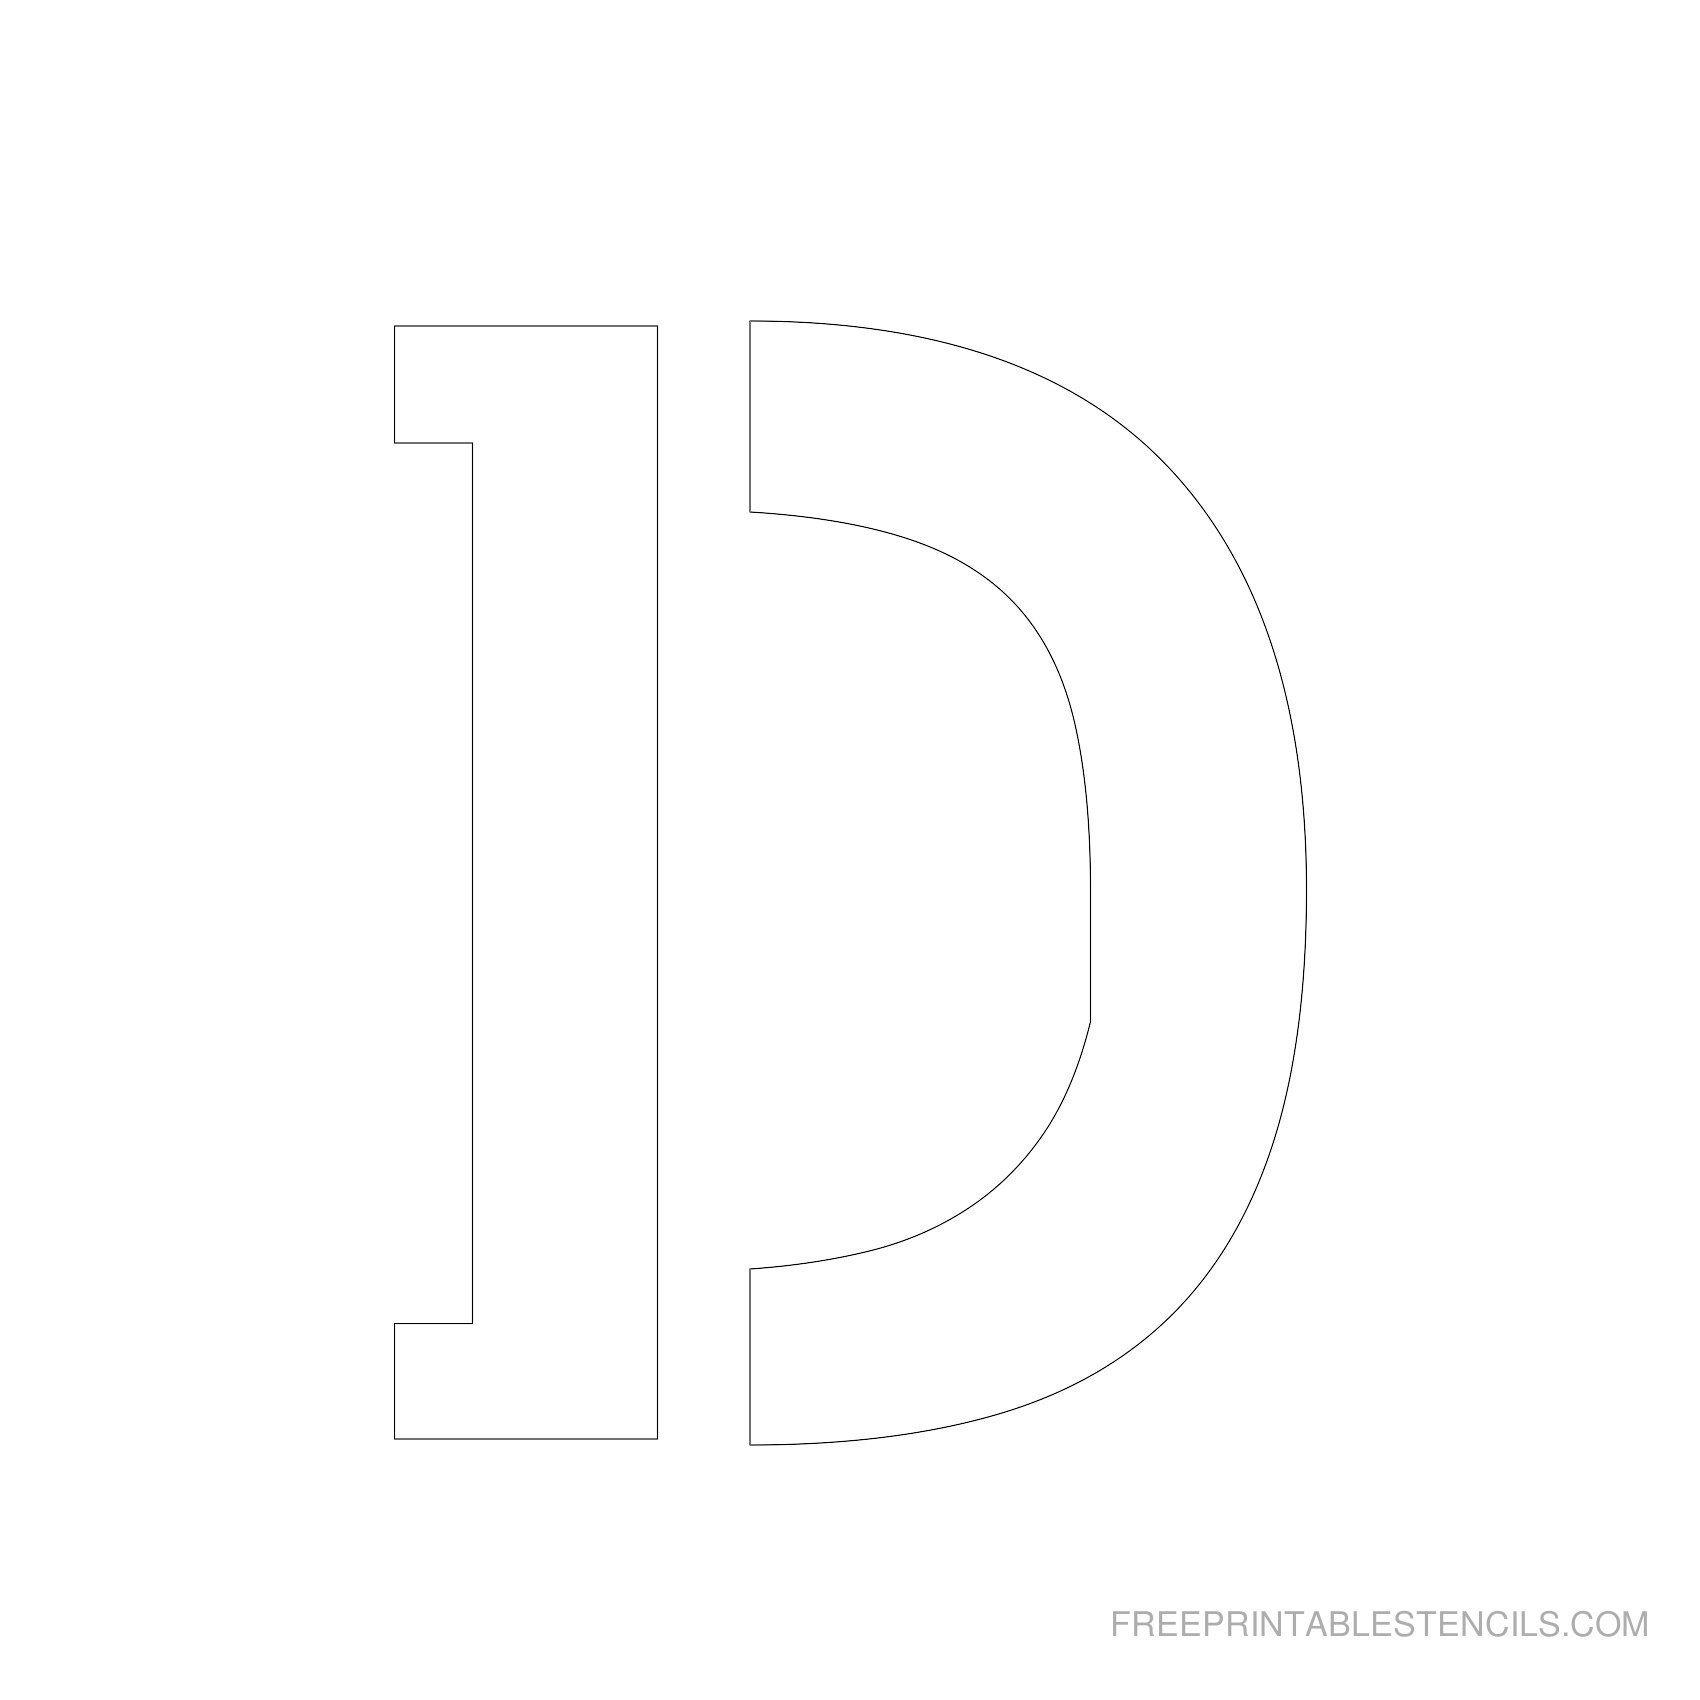 Printable 5 Inch Letter Stencils | Lettering | Letter Stencils To - Free Printable 5 Inch Number Stencils